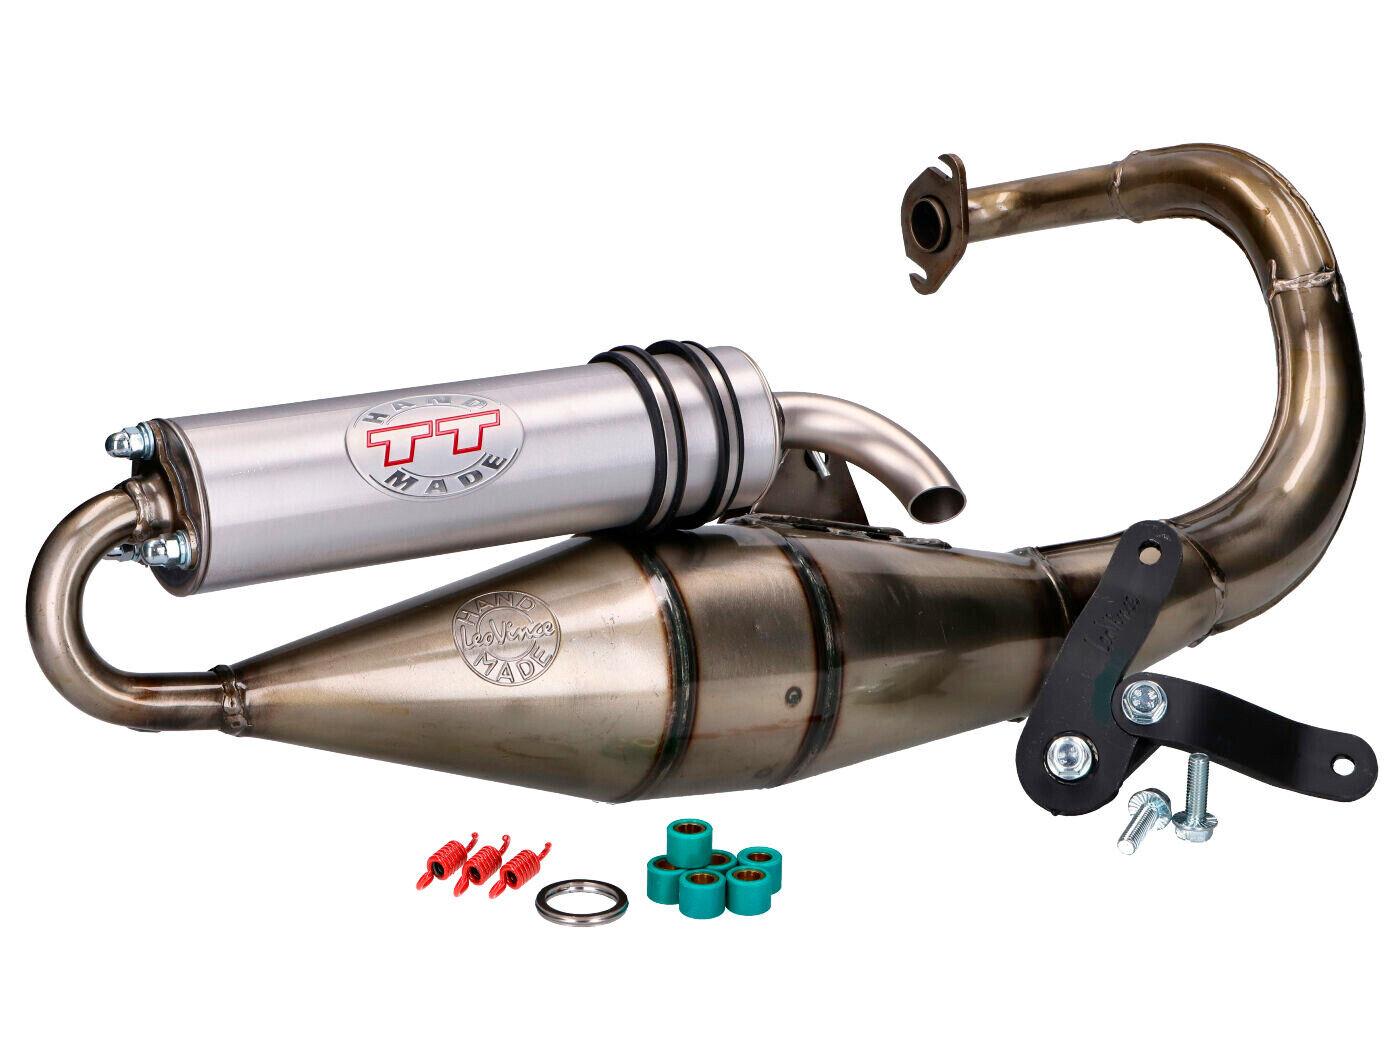 "a 2 tempi tubo di scappamento sportivo da Tuning per Peugeot Speedfight 3 50 e Peugeot Speedfight 4 da 50 ccm LeoVince /""TT Carbon/"""